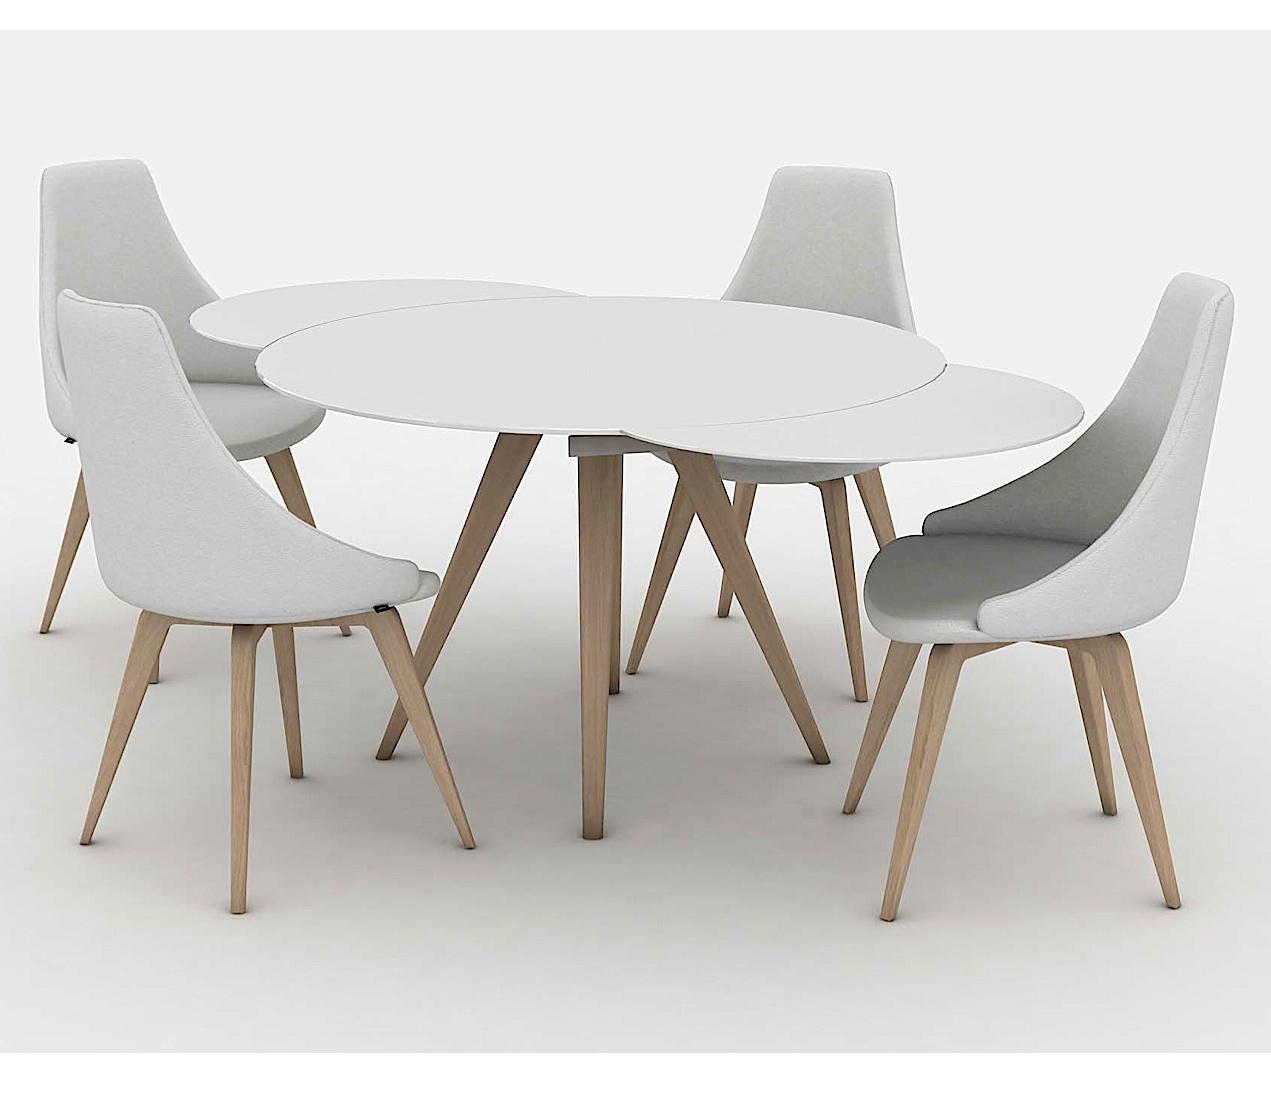 Elan Legno Round Extending Dining Table-33120